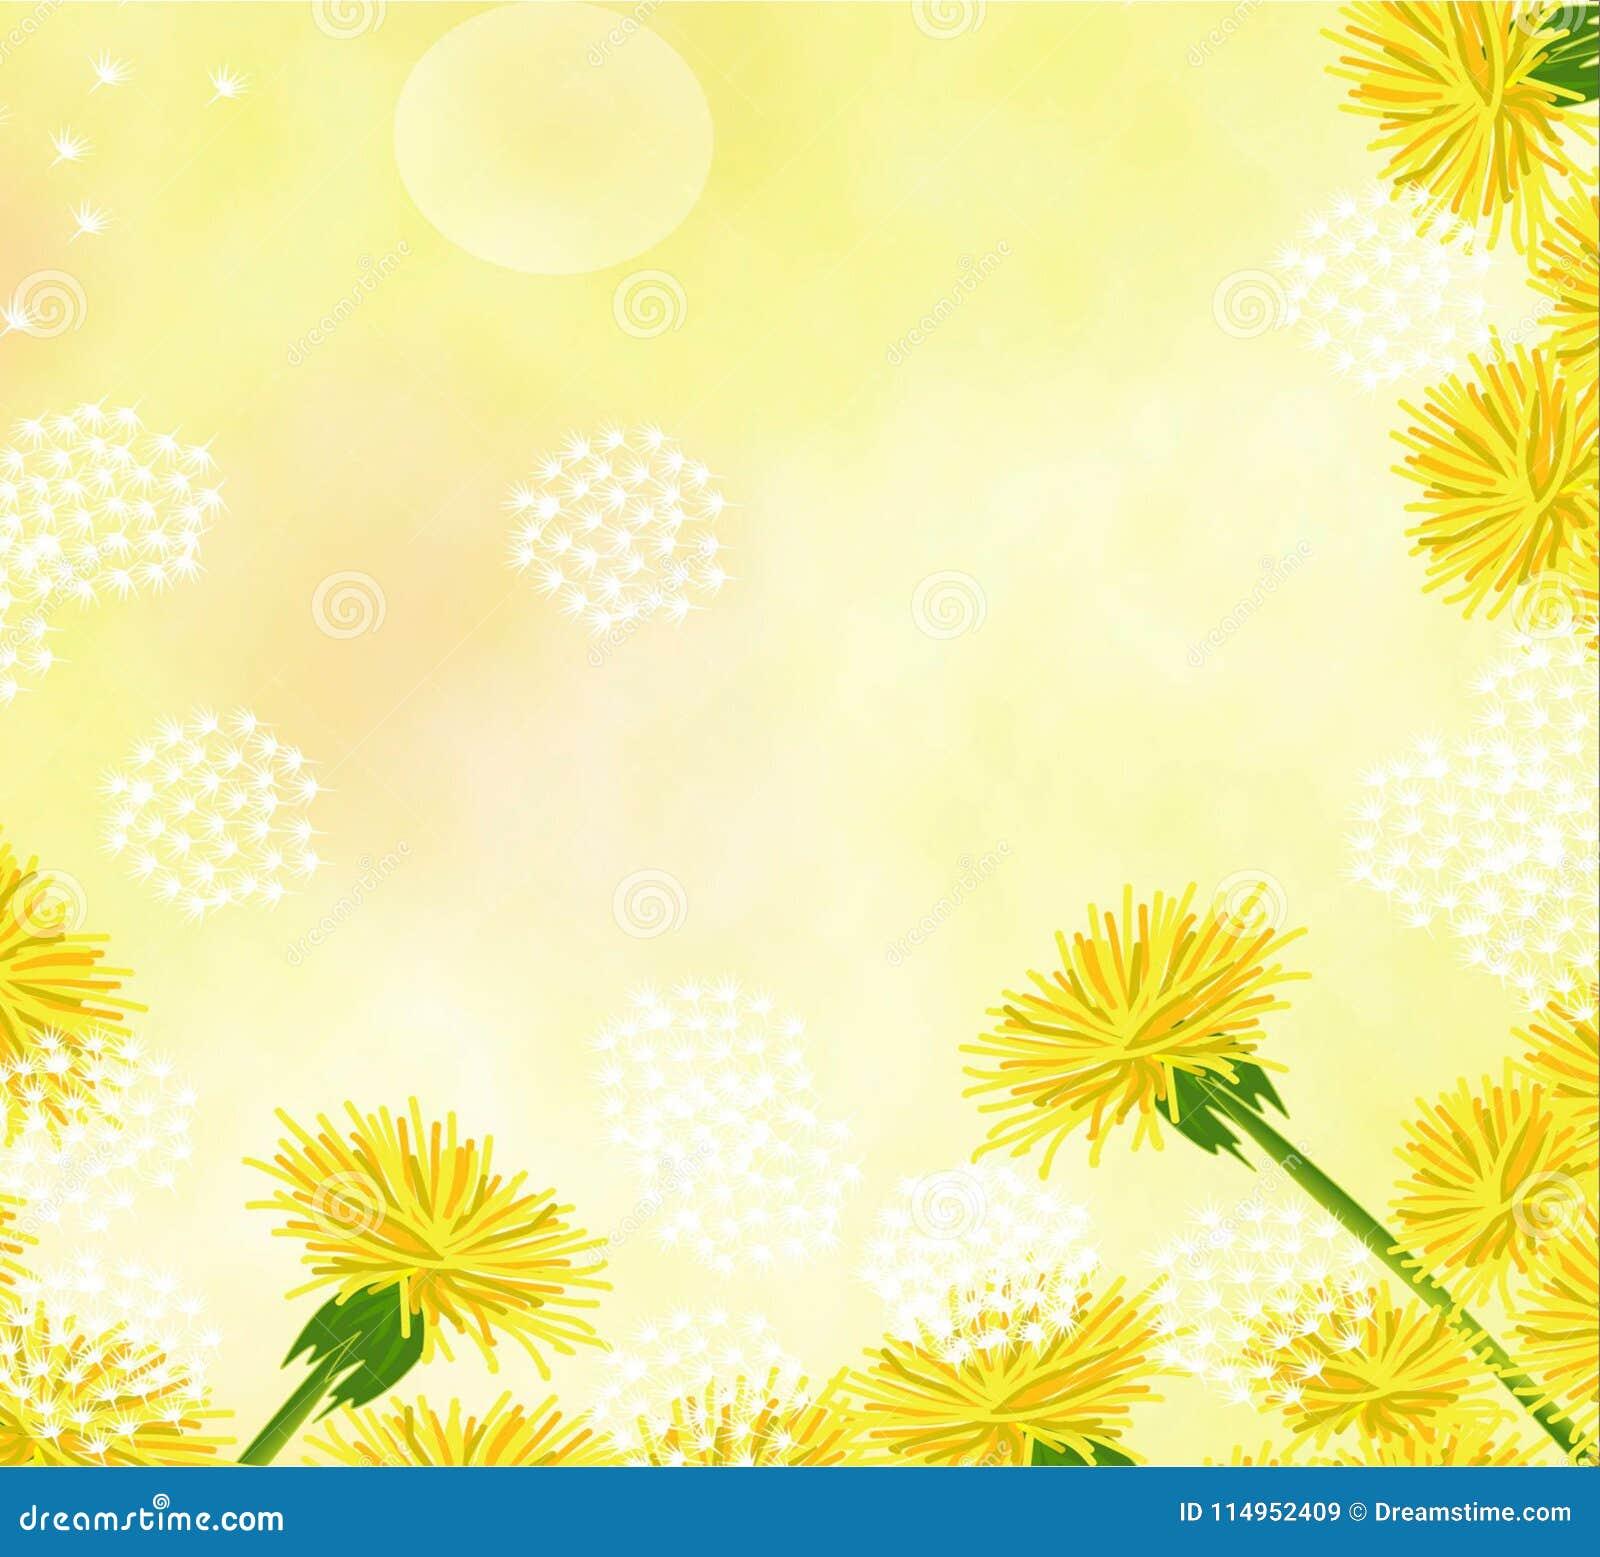 flowers dandelions pale beautiful beautiful background